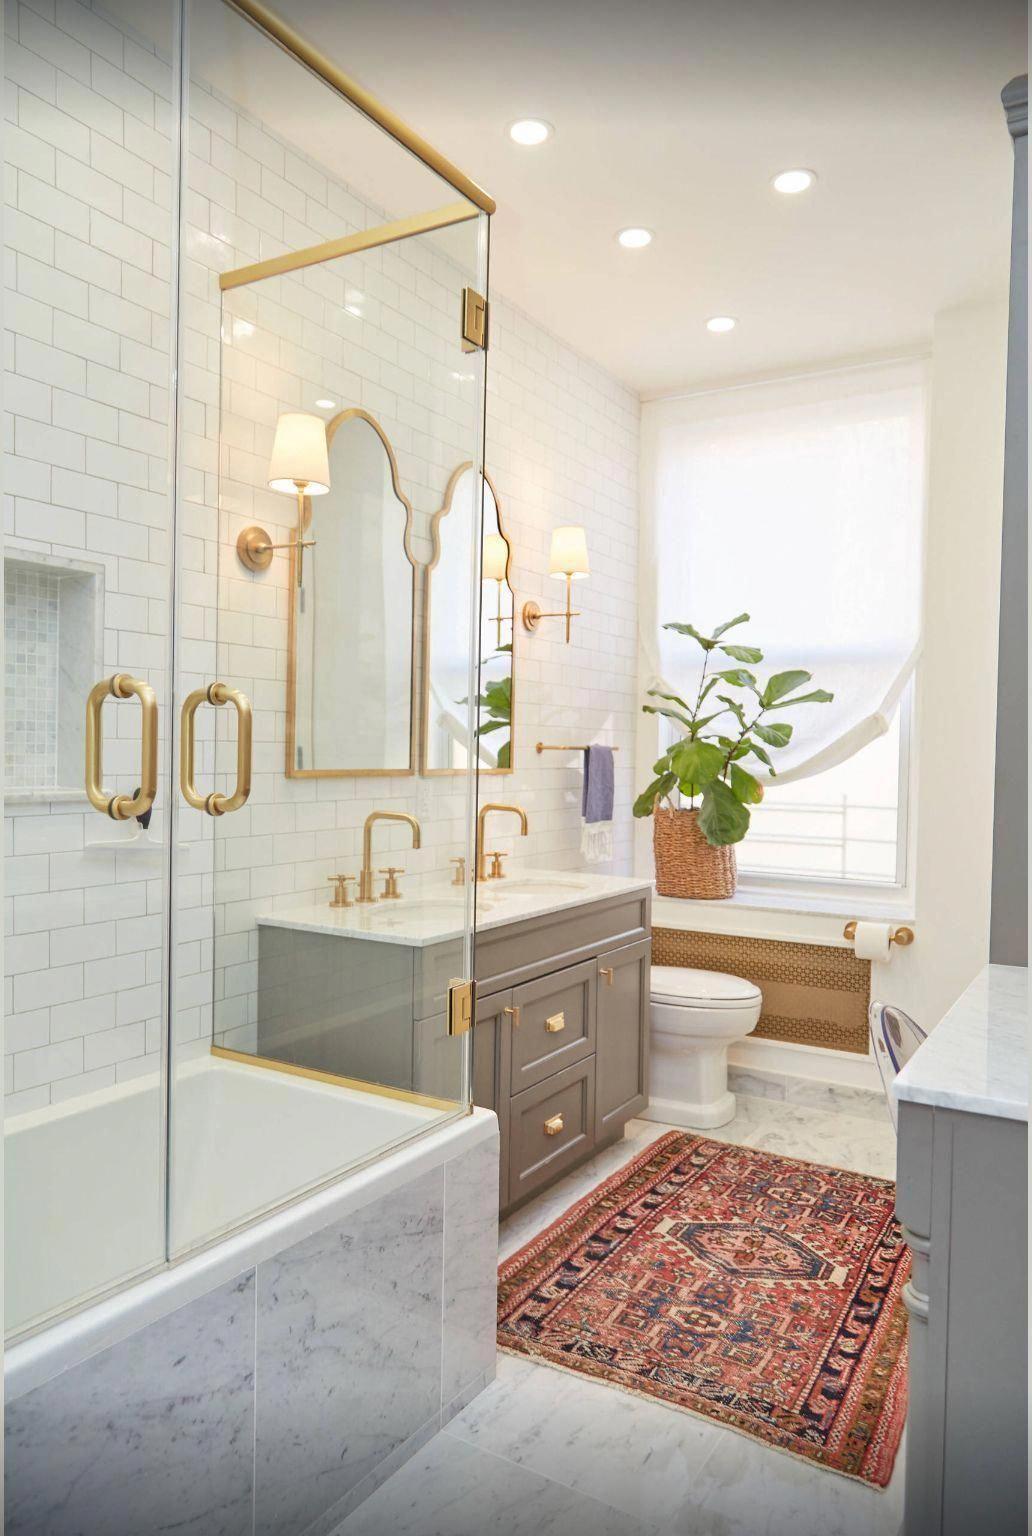 budget bathroom remodel ideas budget bathroom remodel on bathroom renovation ideas id=44798